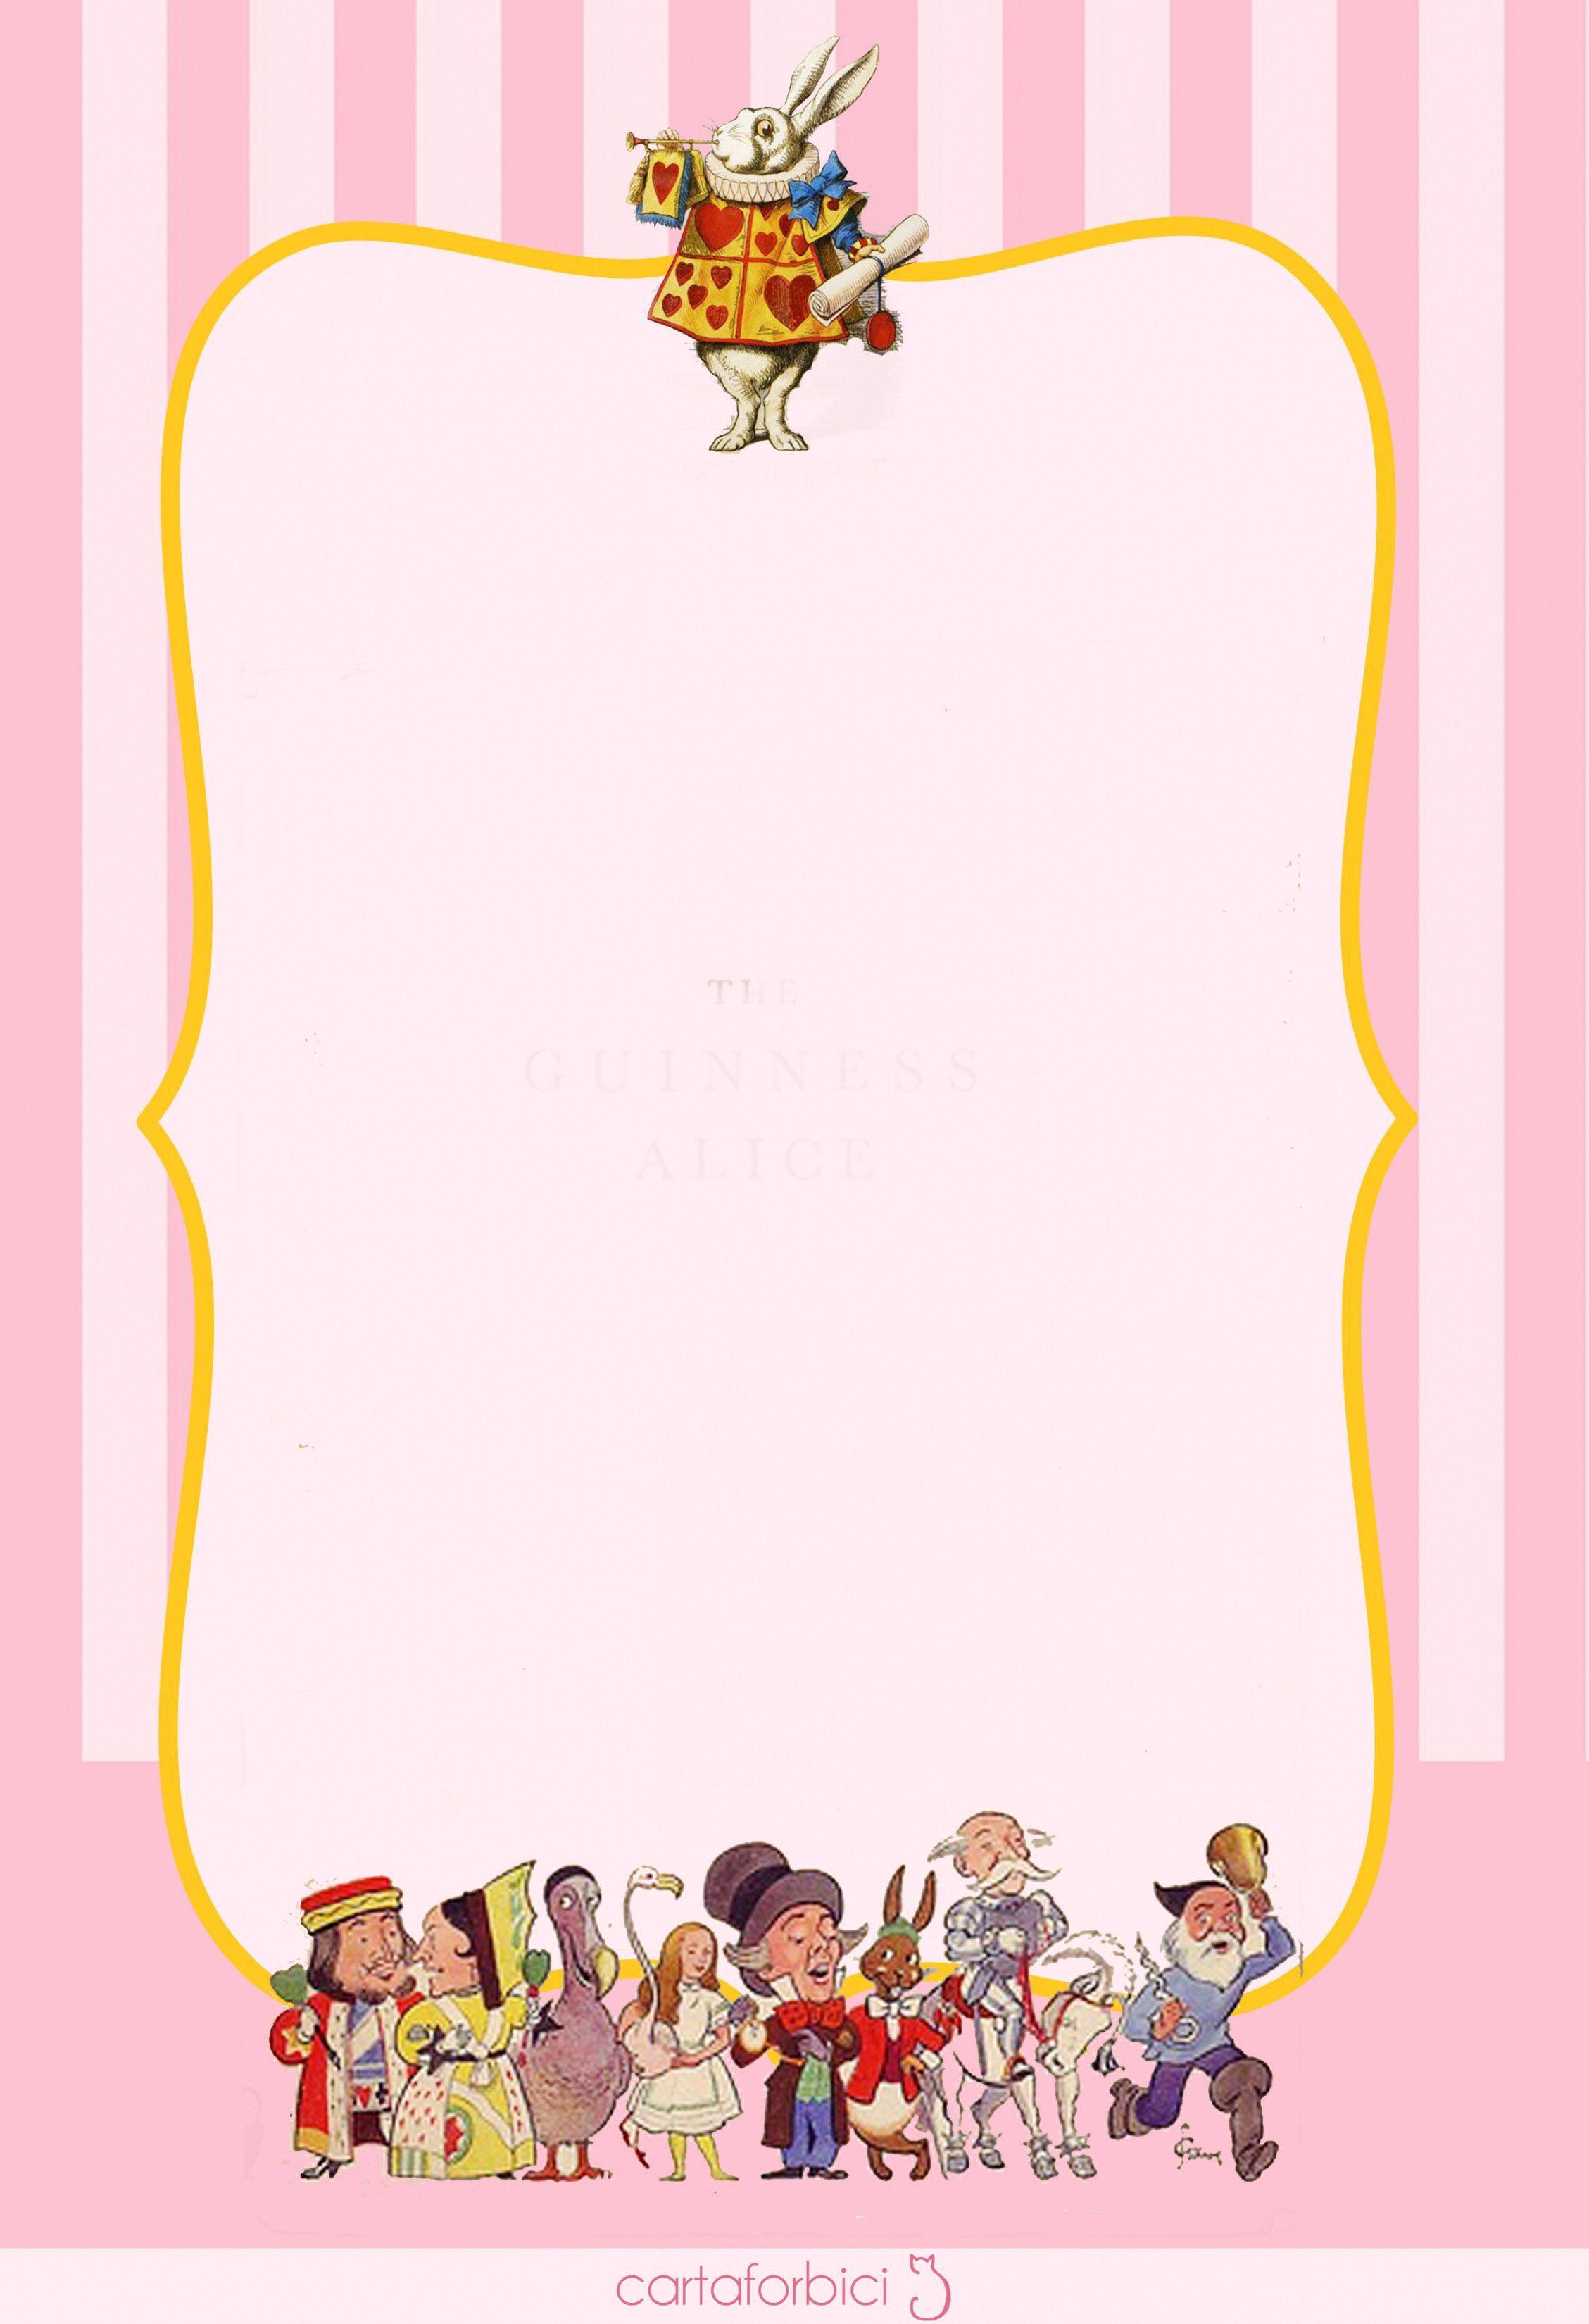 001 Wondrou Alice In Wonderland Invitation Template Design  Templates Wedding Birthday Free Tea PartyFull